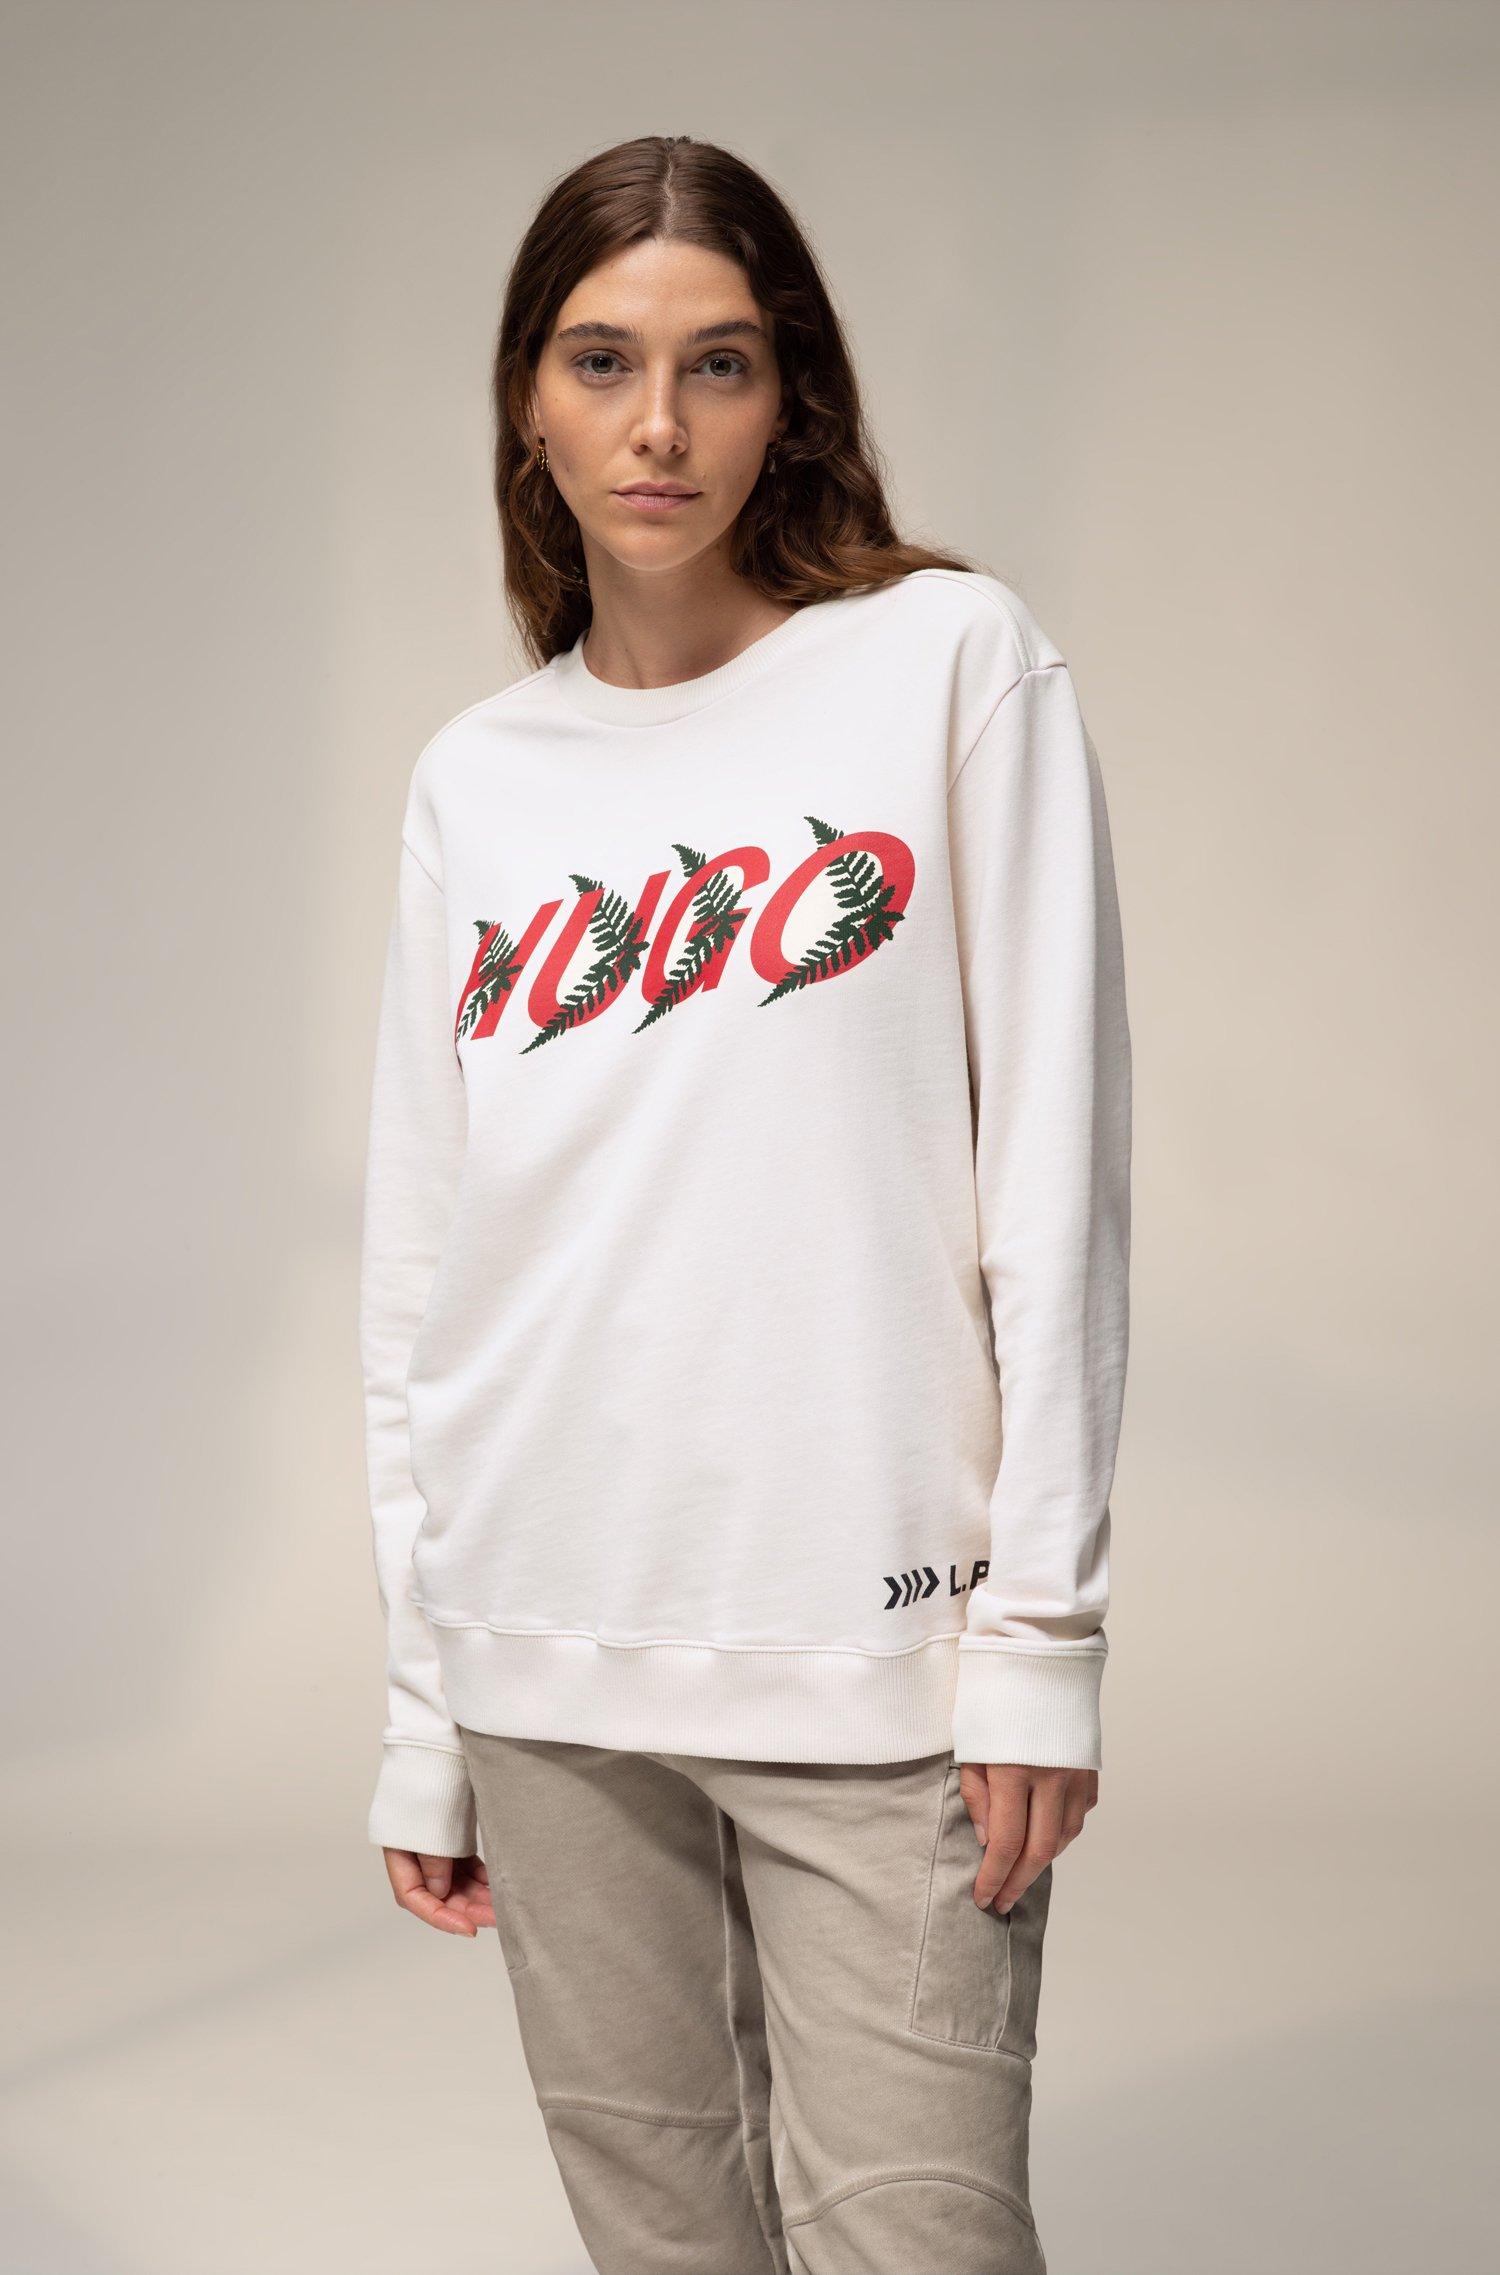 Unisex sweatshirt in cotton with forest-inspired logo motif, White